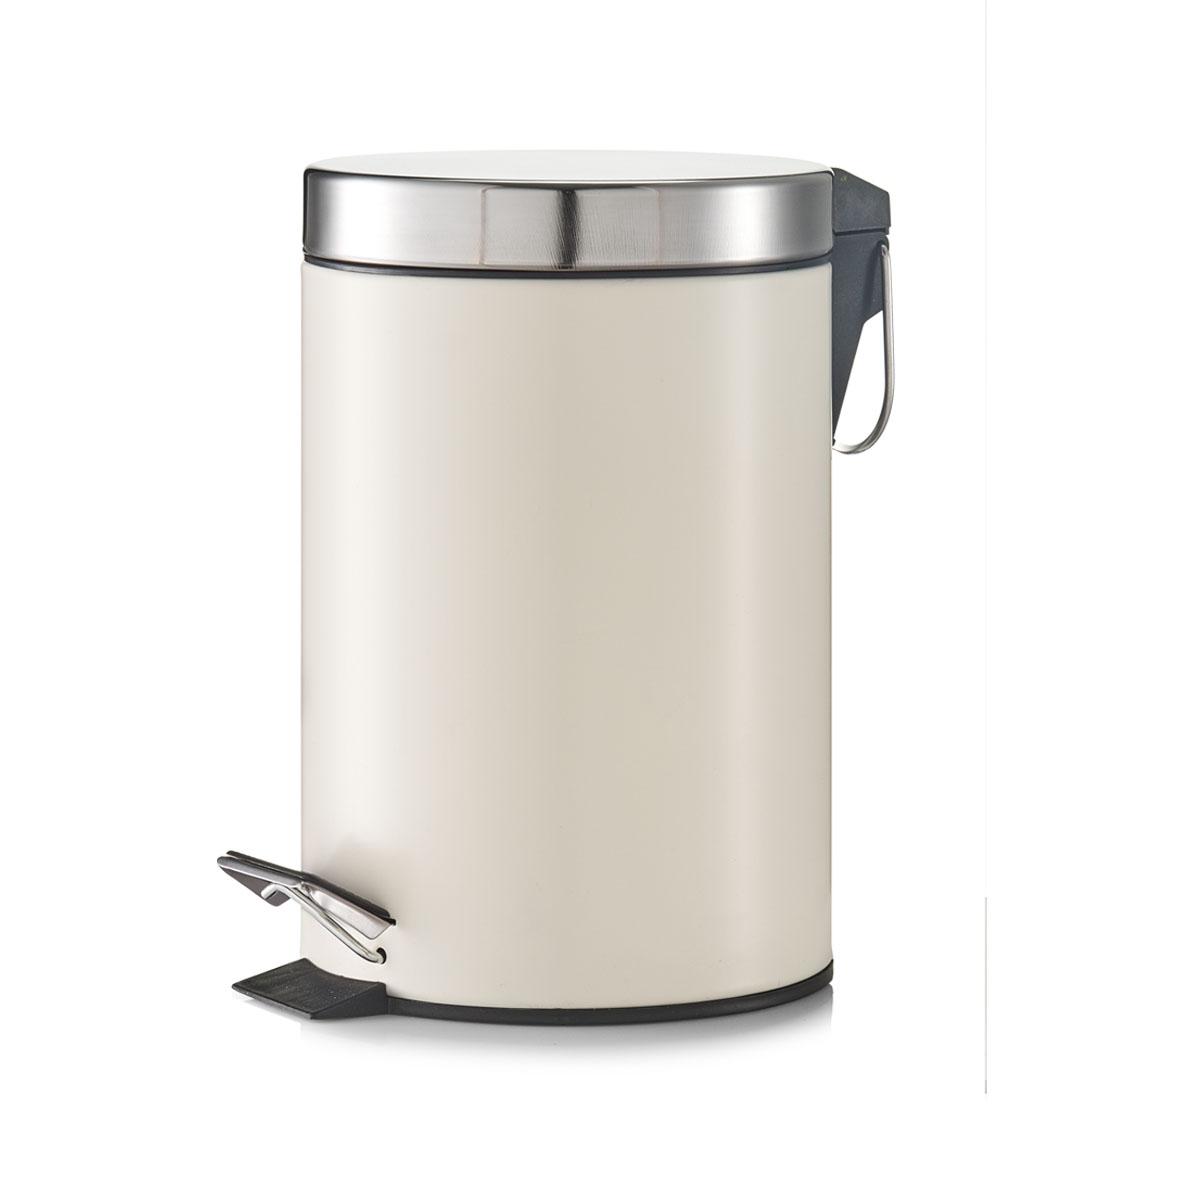 Cos de gunoi cu pedala pentru baie Metal Capac argintiu 3L